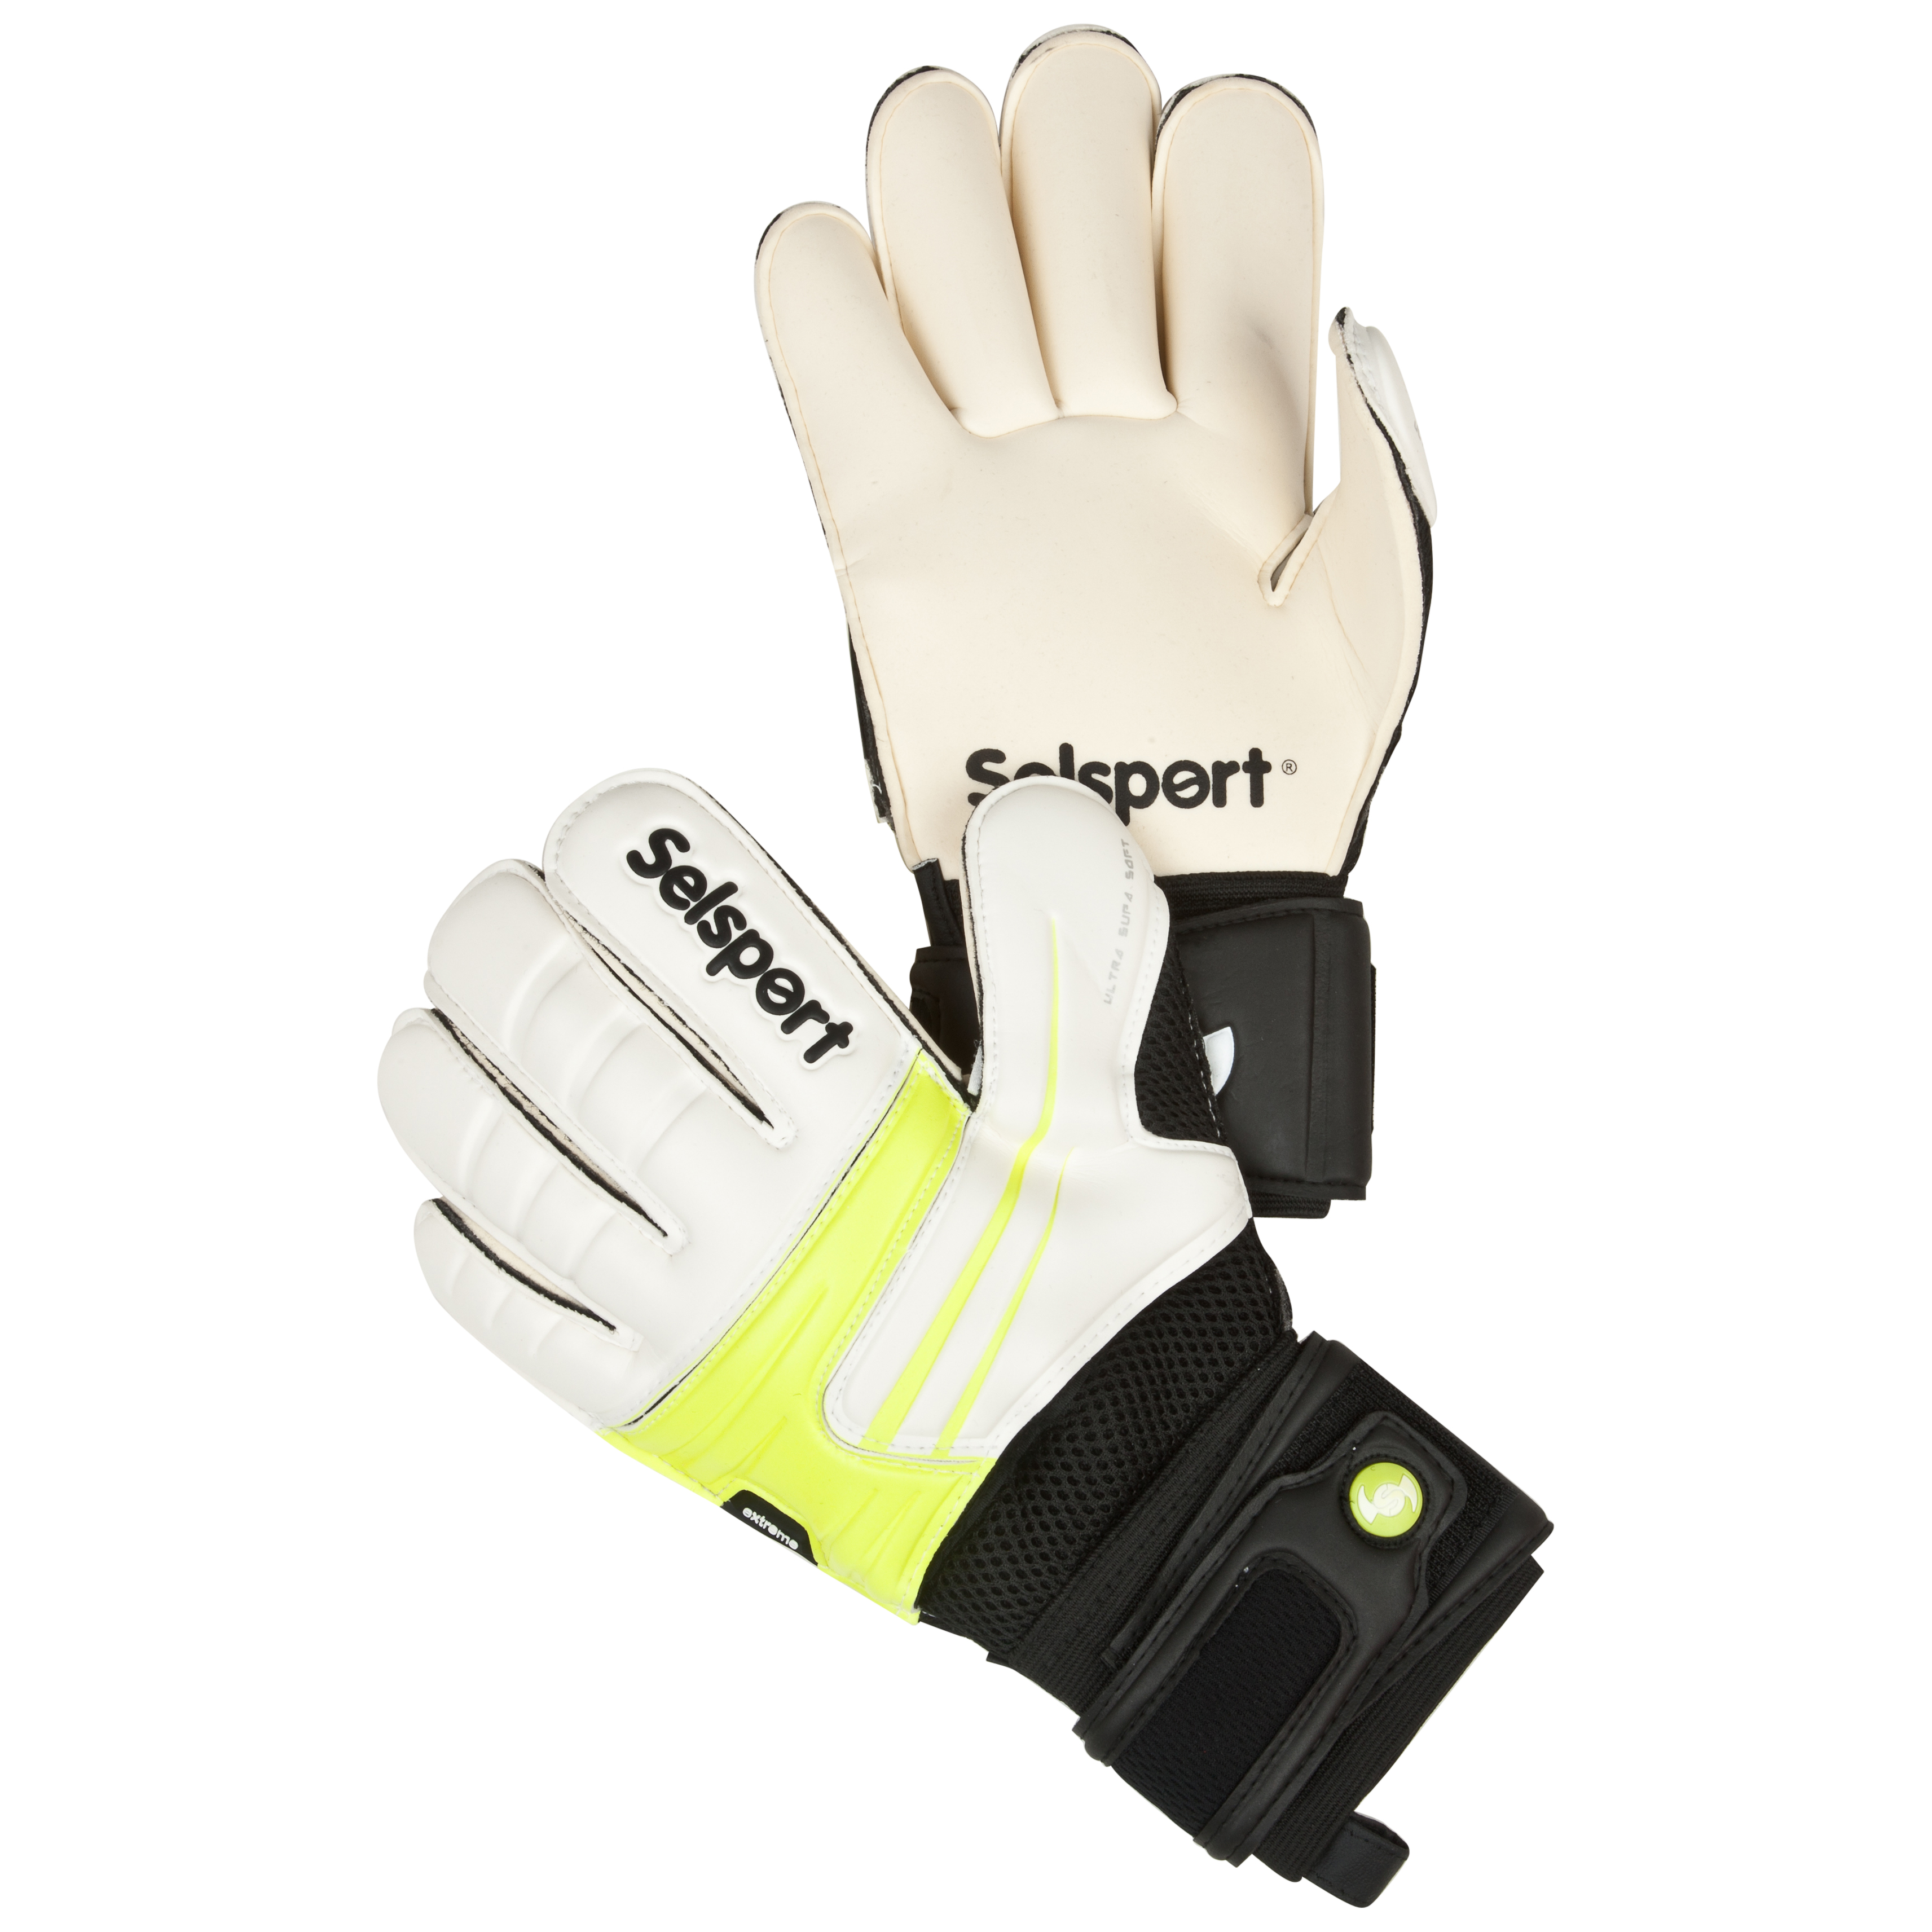 Selsport Extreme 6 Goalkeeper Gloves - Lime